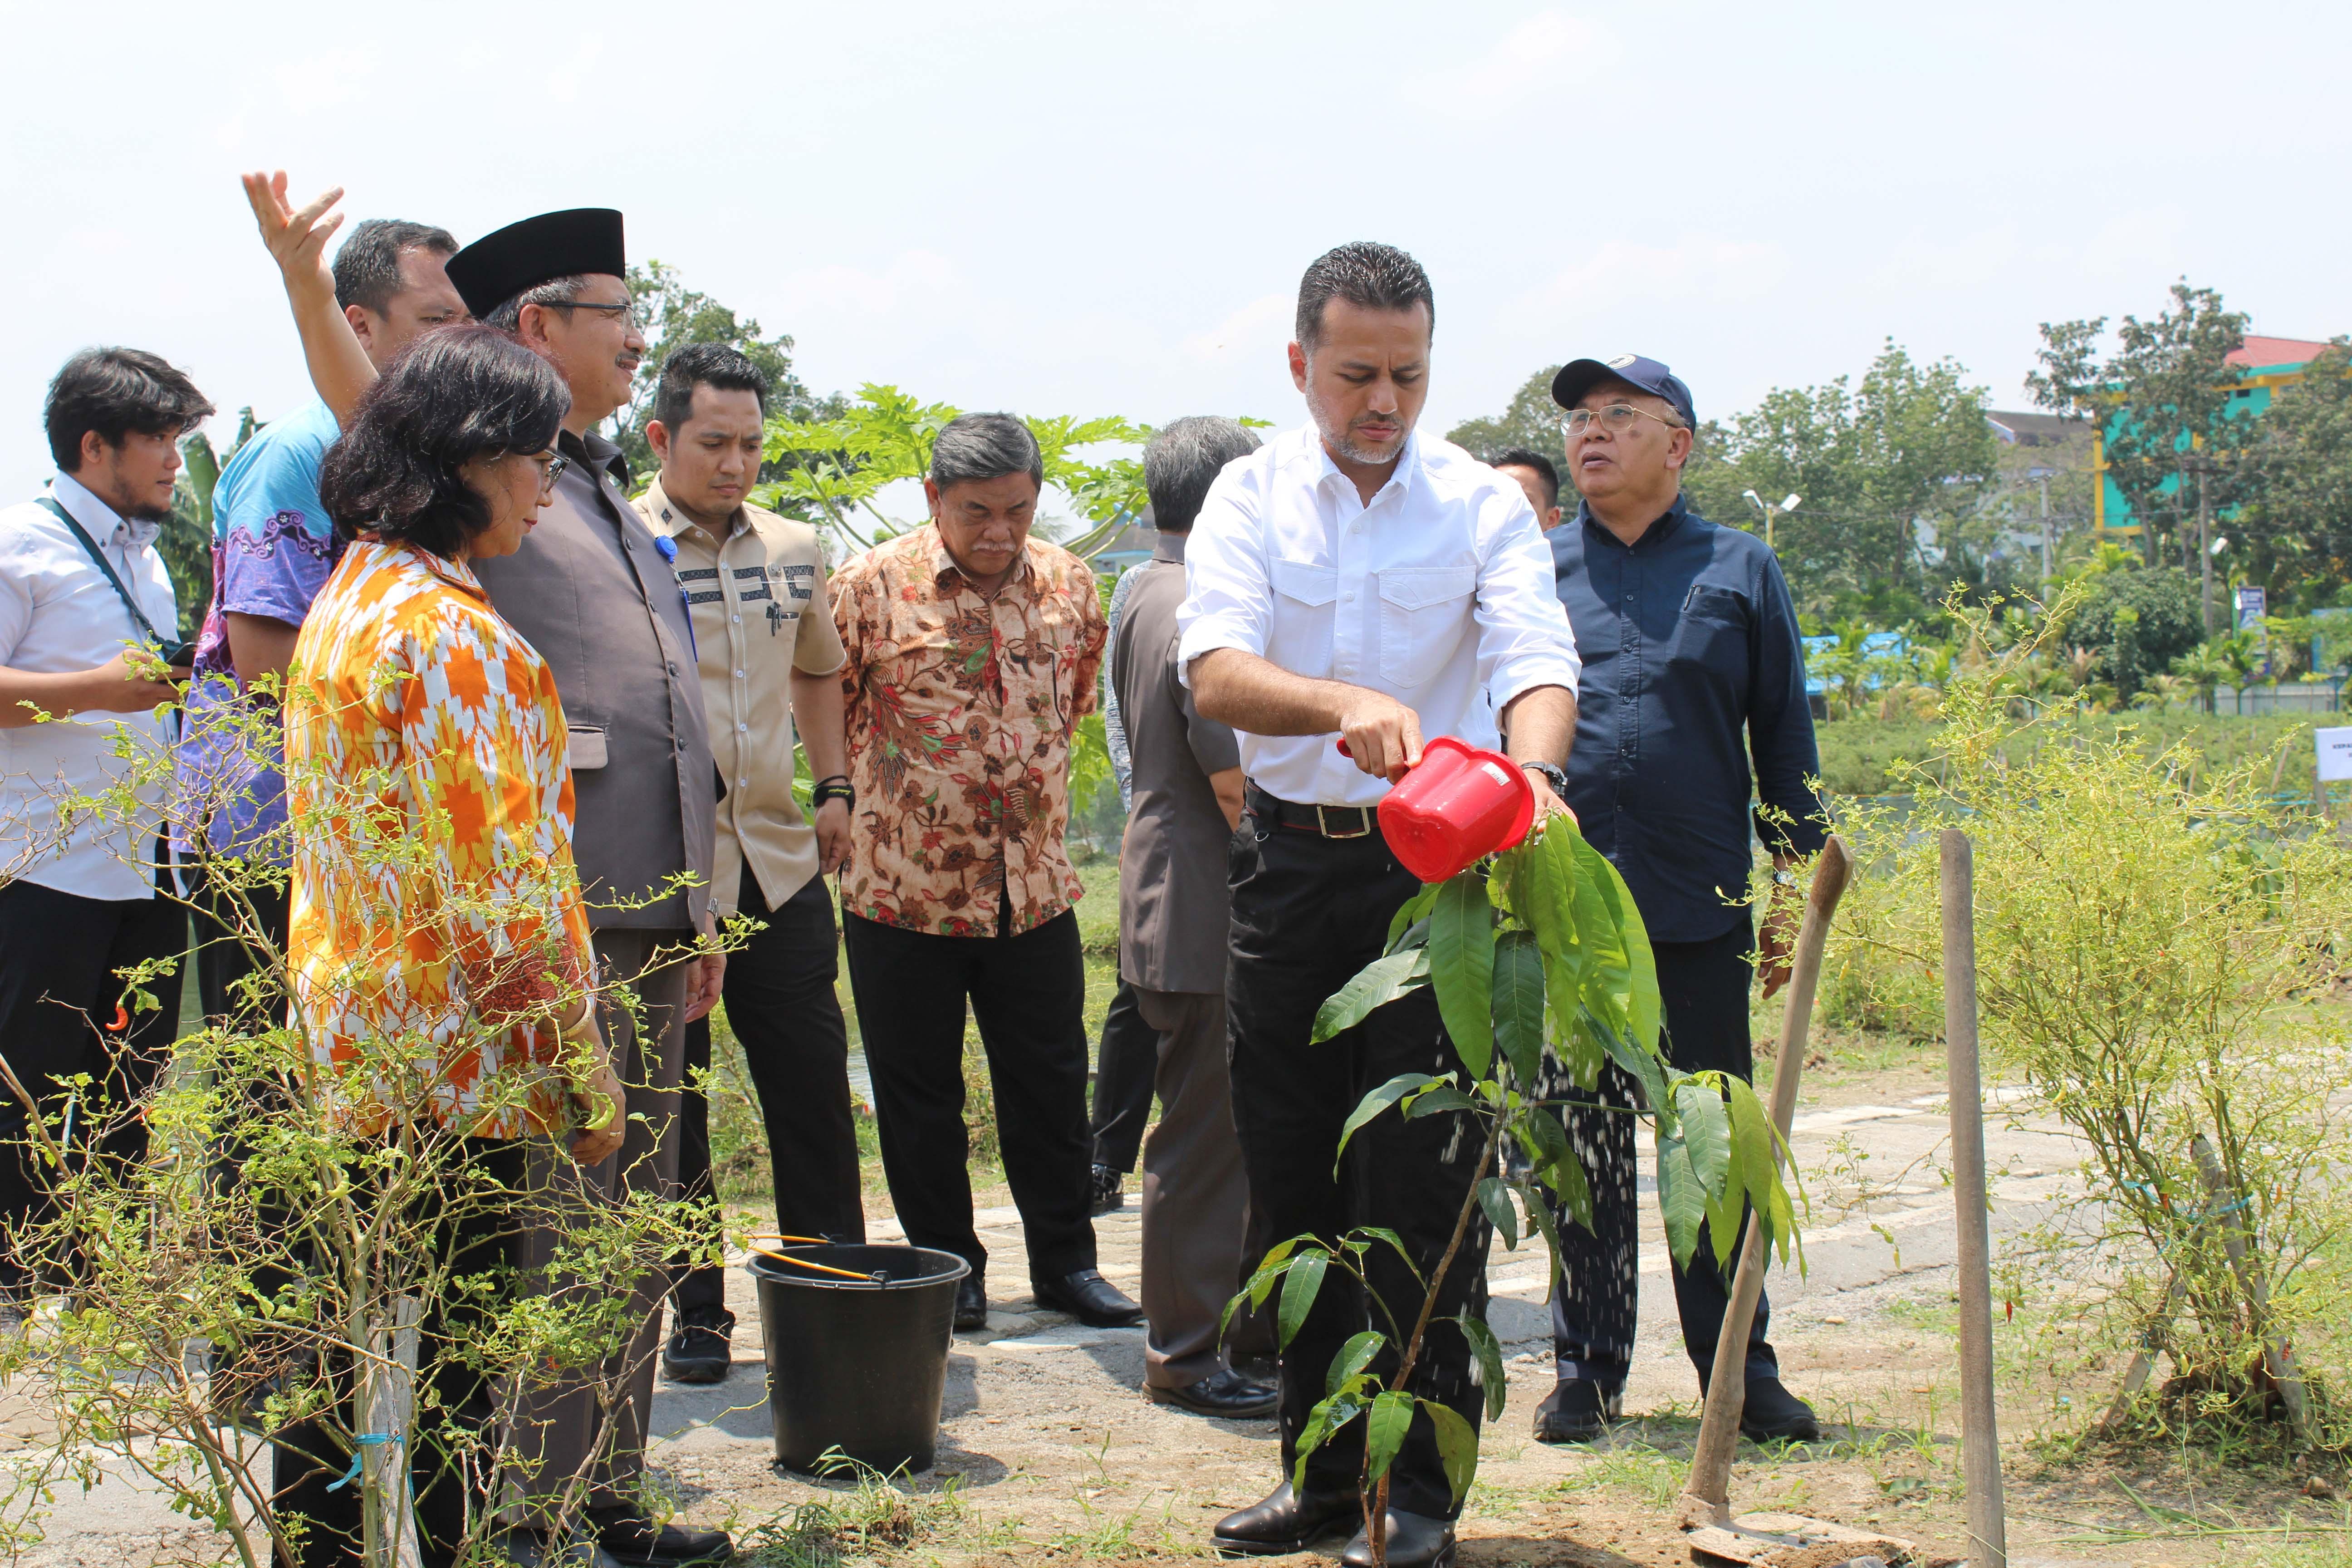 penanaman-pohon-wakil-gubernur-sumatera-utara-di-kebun-percobaan-uma-teknikuma